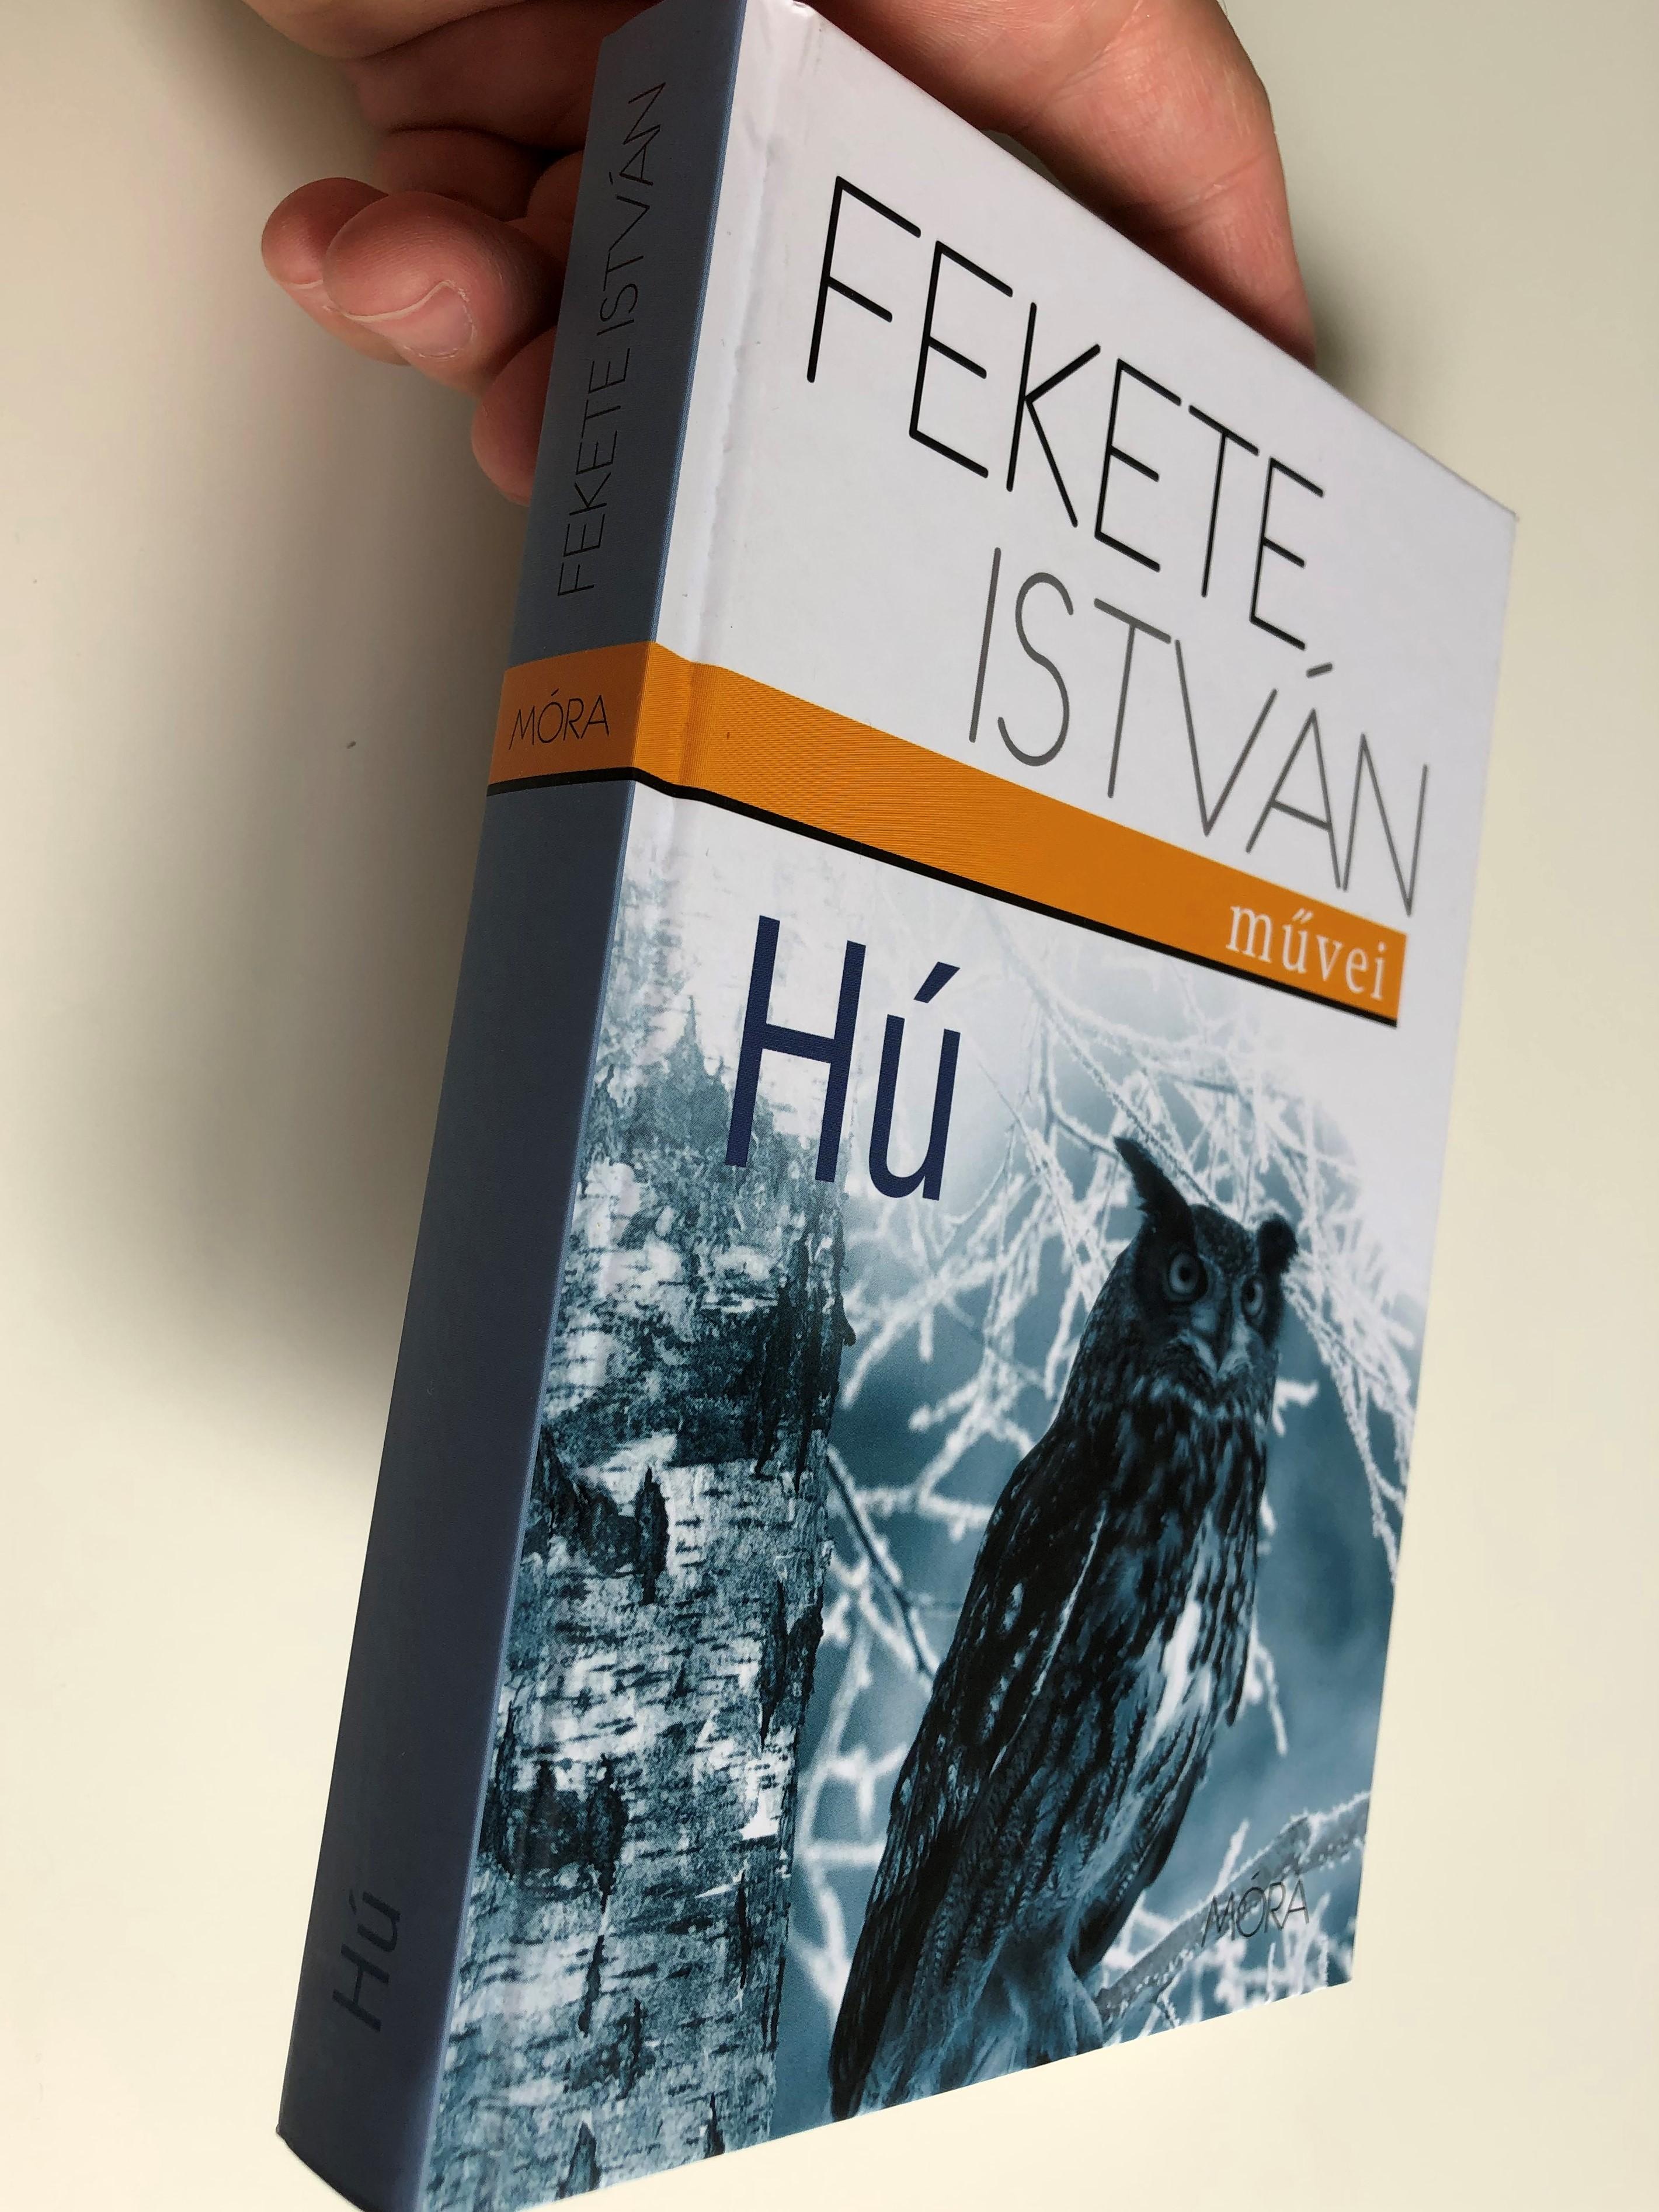 h-by-fekete-istv-n-illustrations-by-bakai-piroska-m-ra-kiad-2013-an-owl-s-novel-by-famous-hungarian-writer-istv-n-fekete-2-.jpg